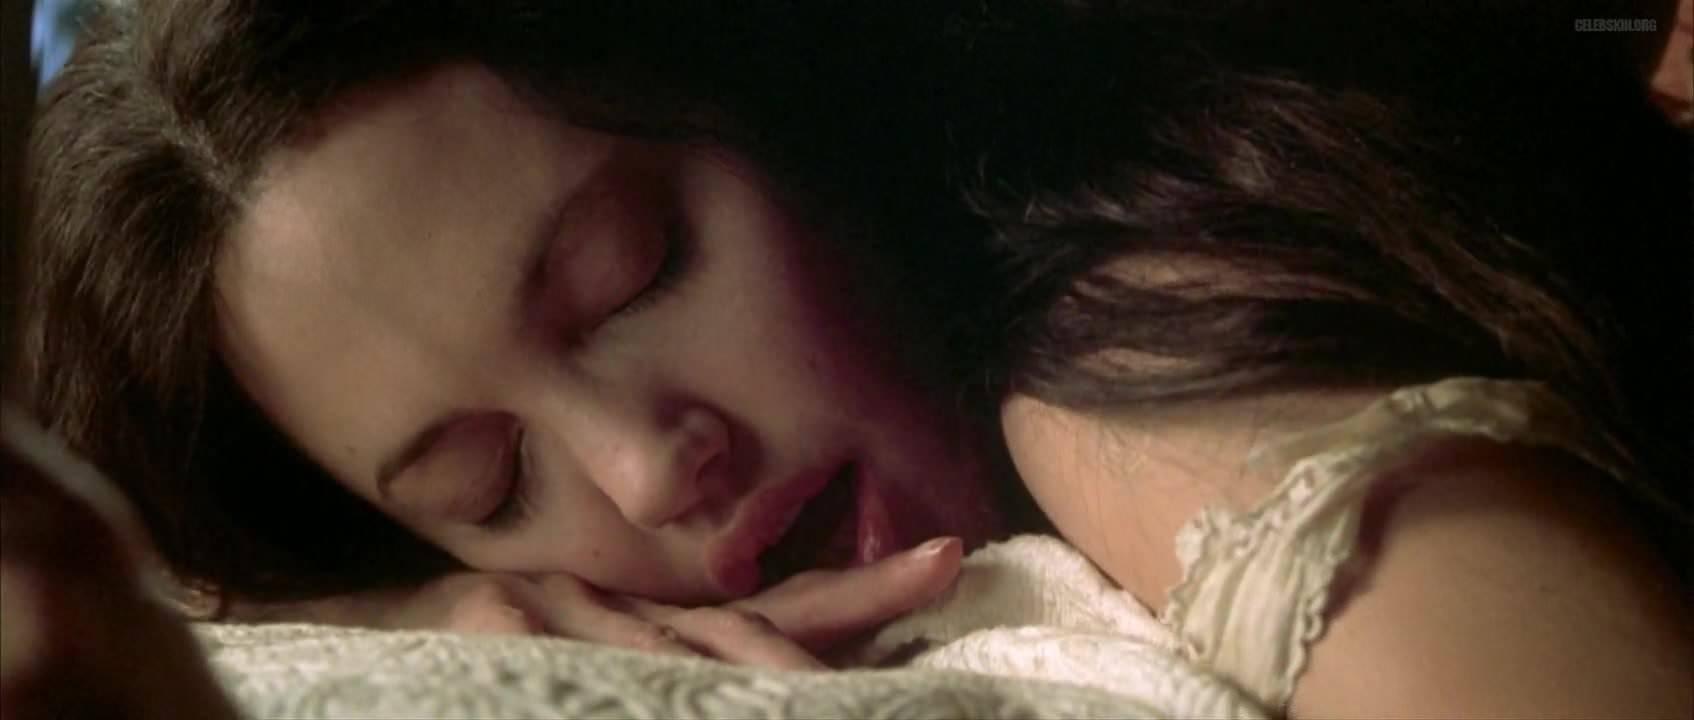 Angelina Jolie Porno Video angelina jolie - 'original sin'